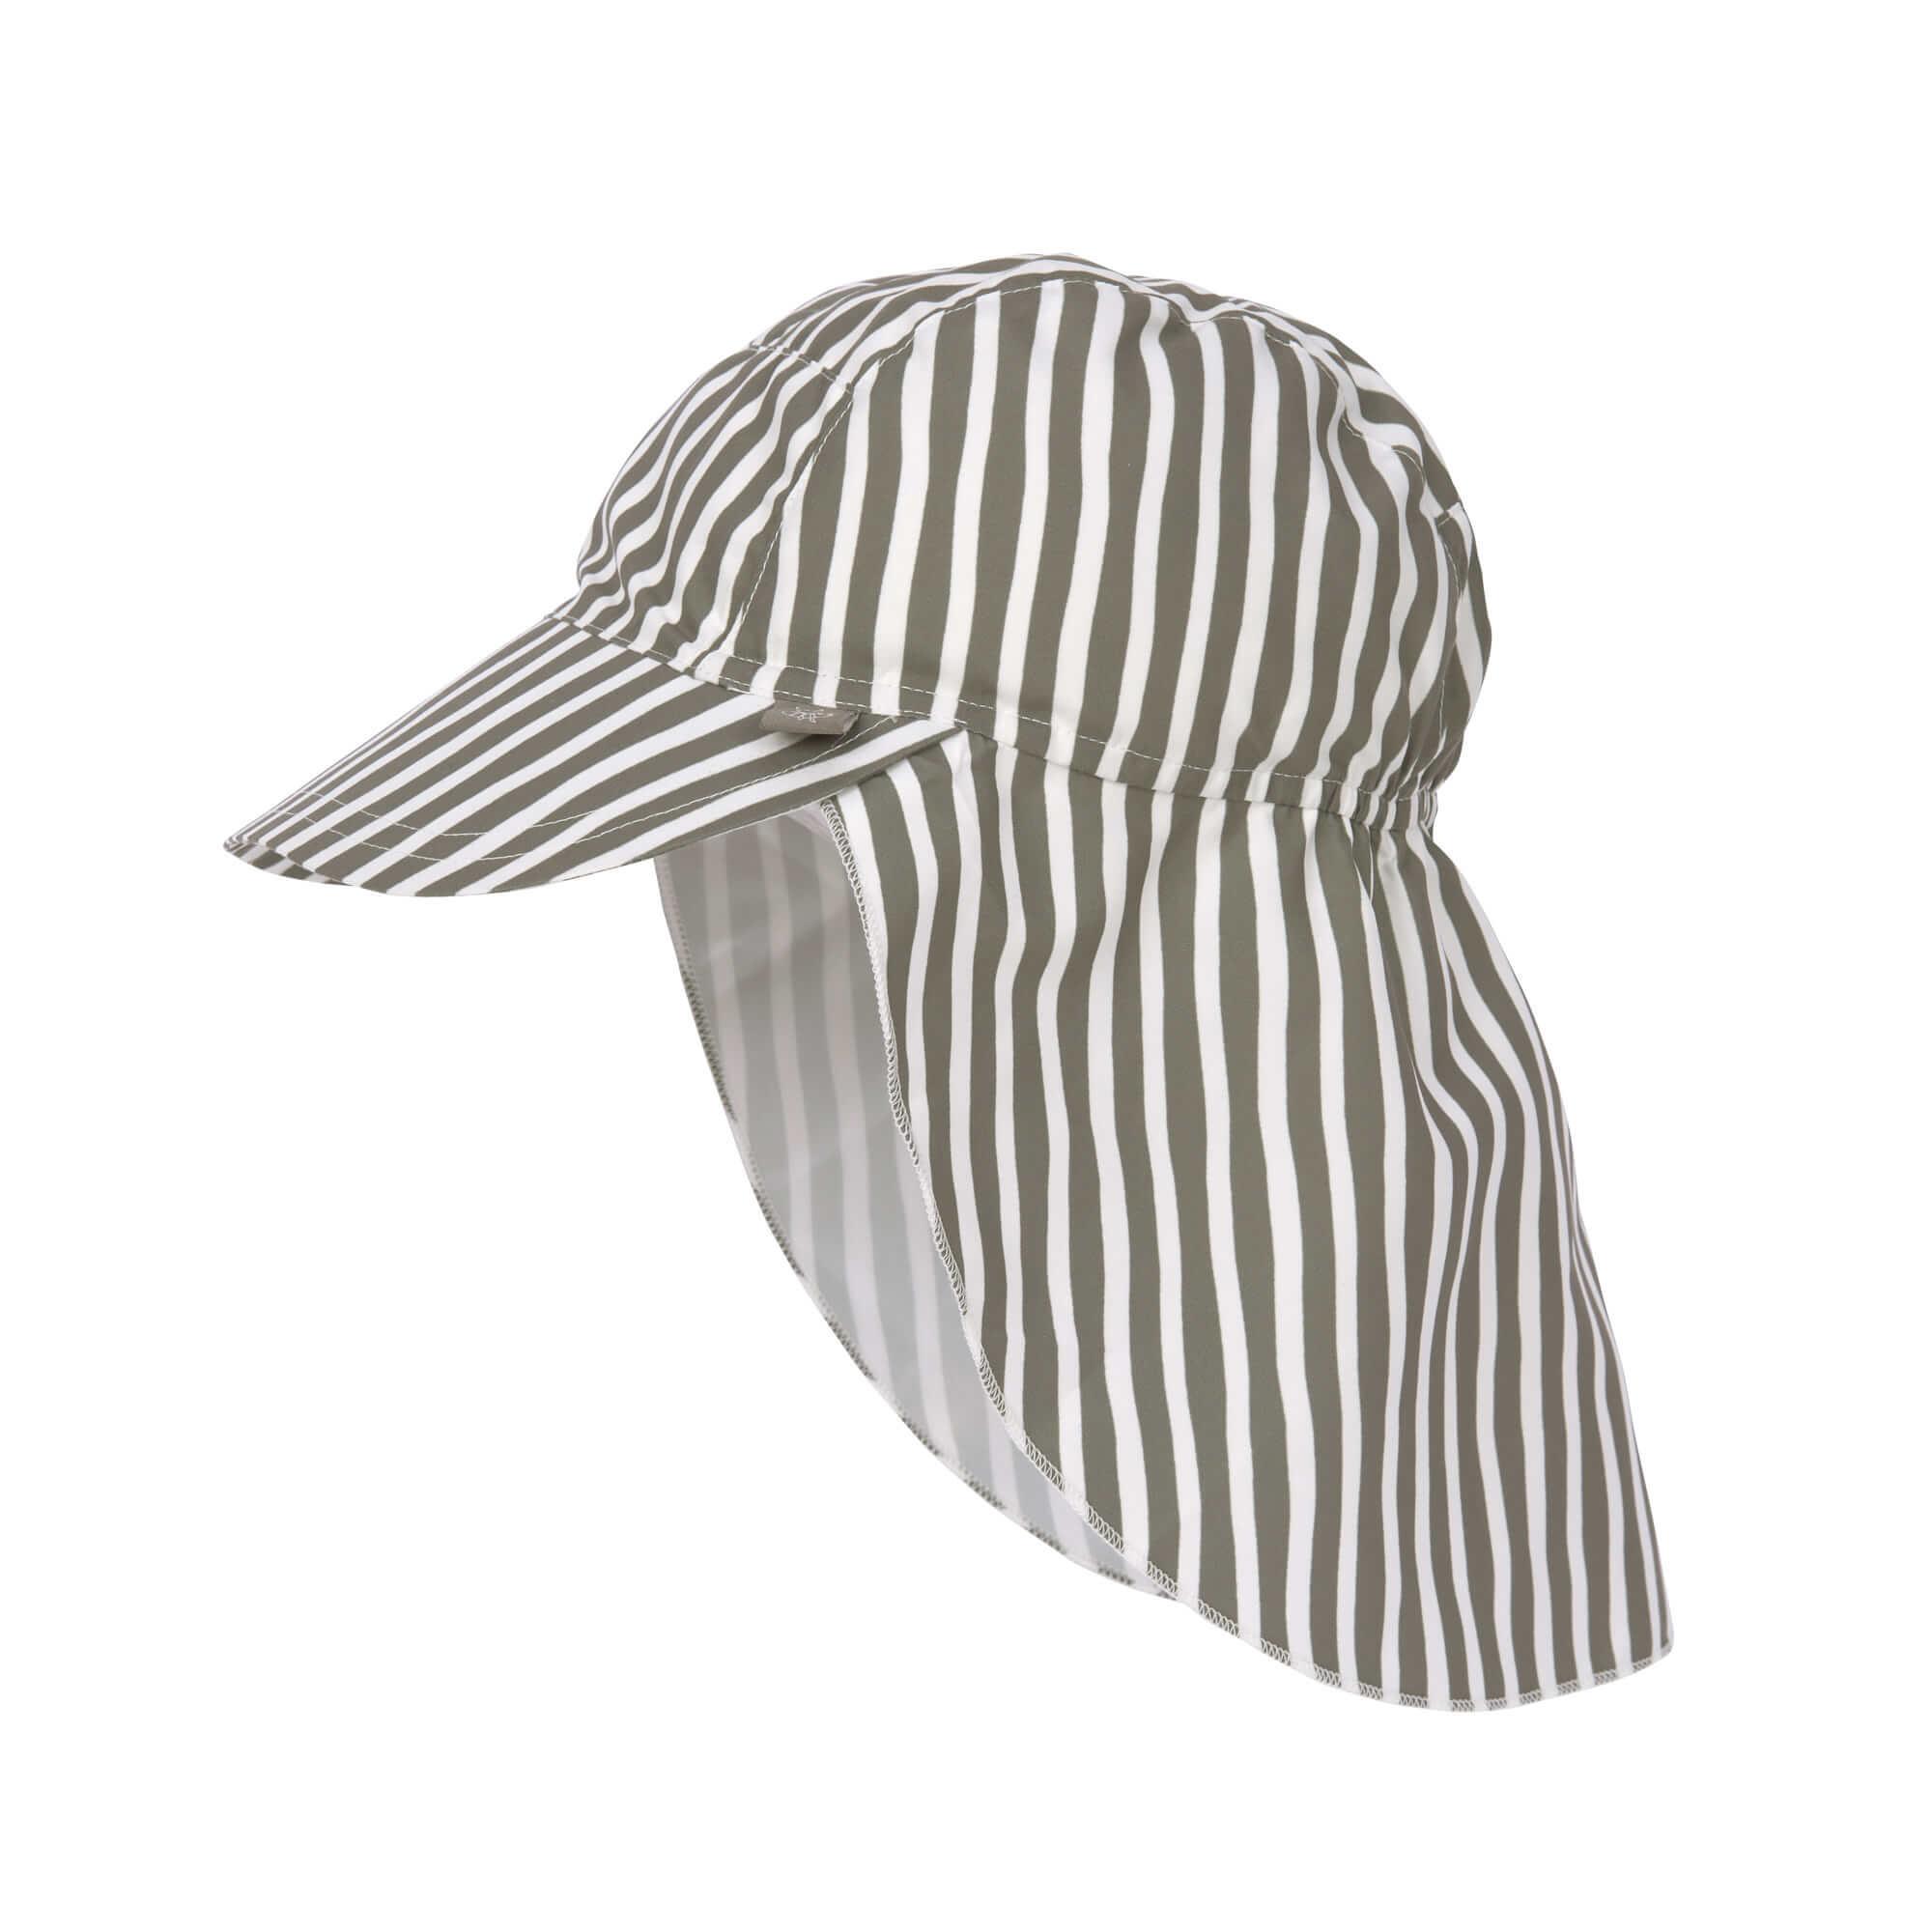 Lässig Splash & Fun Sun Protection Zonnehoed Flaphoed met UV bescherming - Stripes olive 19-36 maand